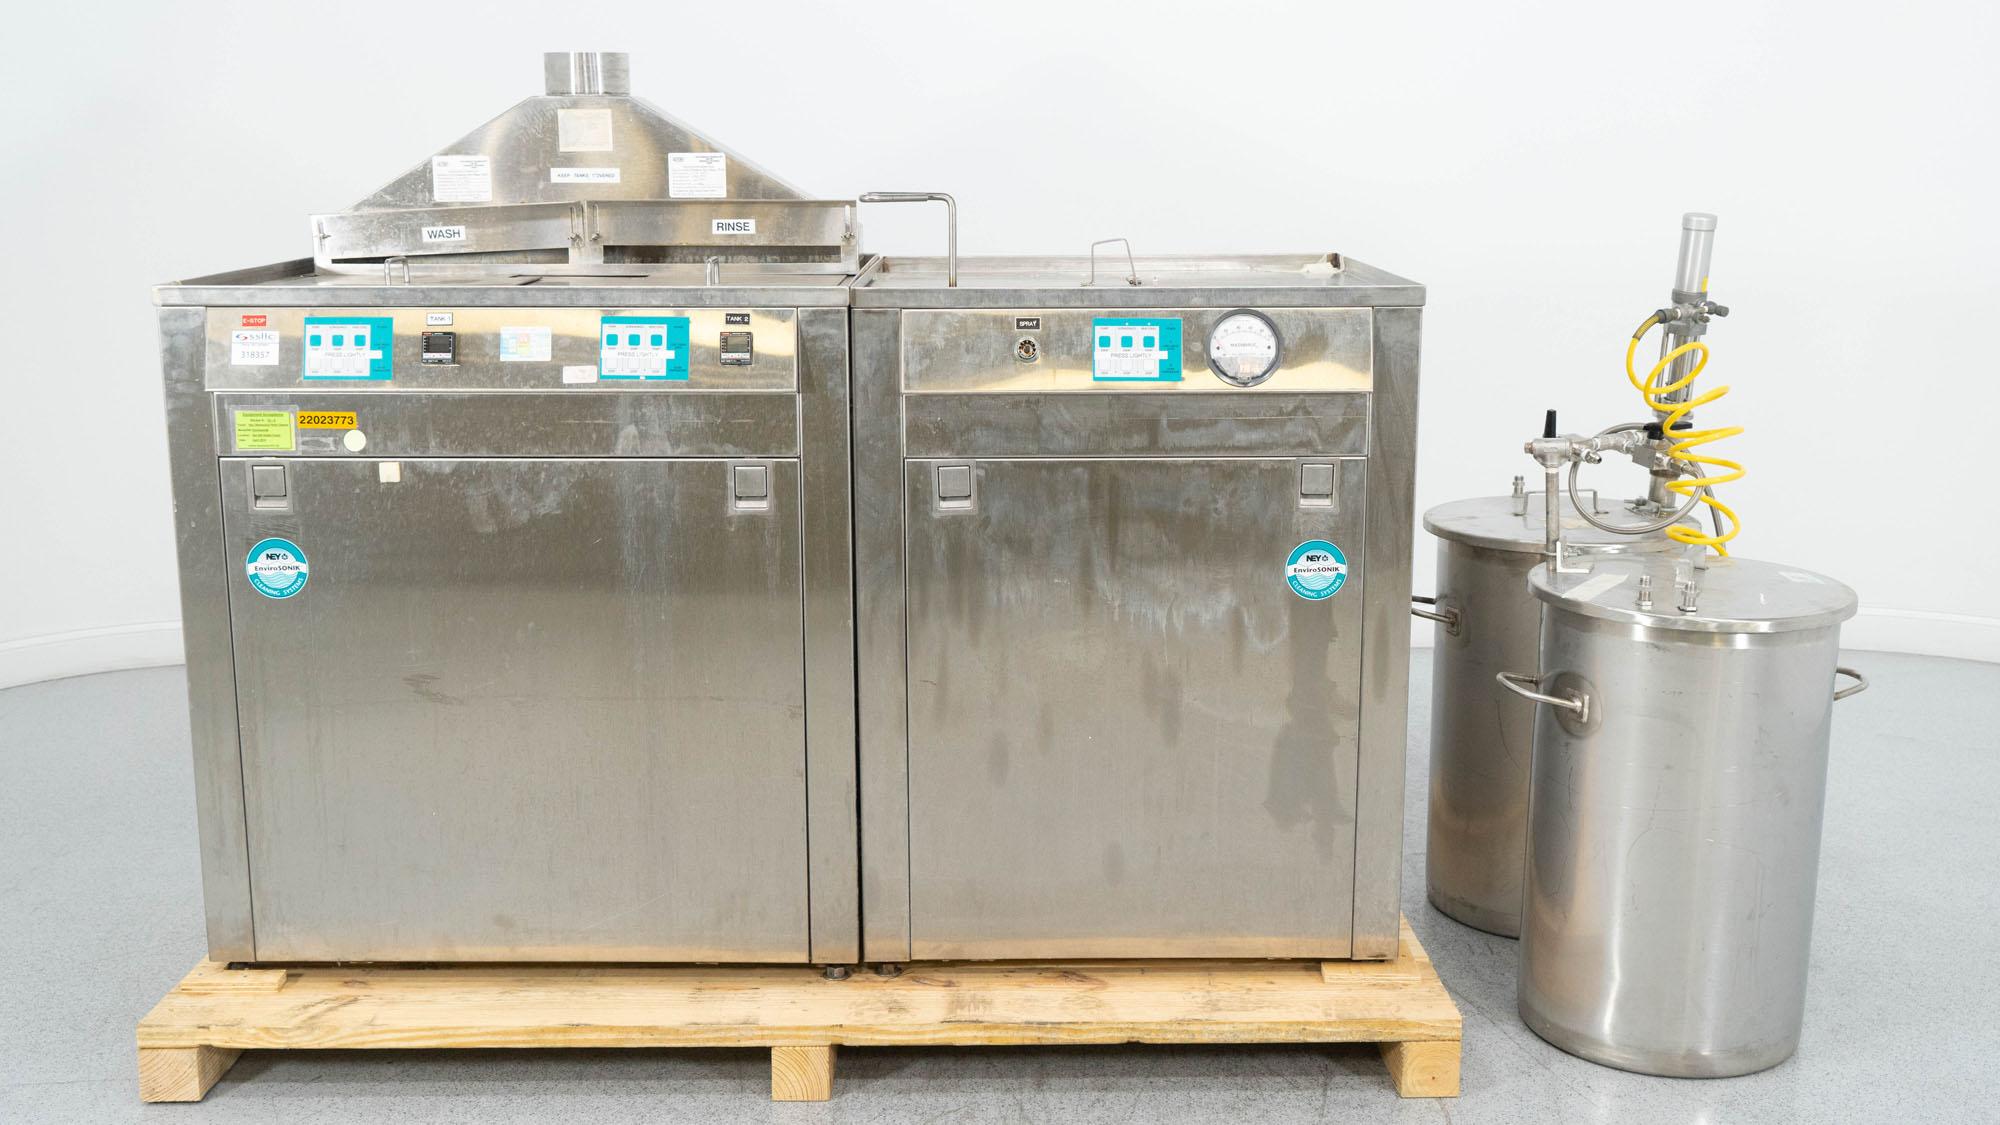 NEY Barkmeyer EnviroSonik Cleaning System, Model BCS-10-US